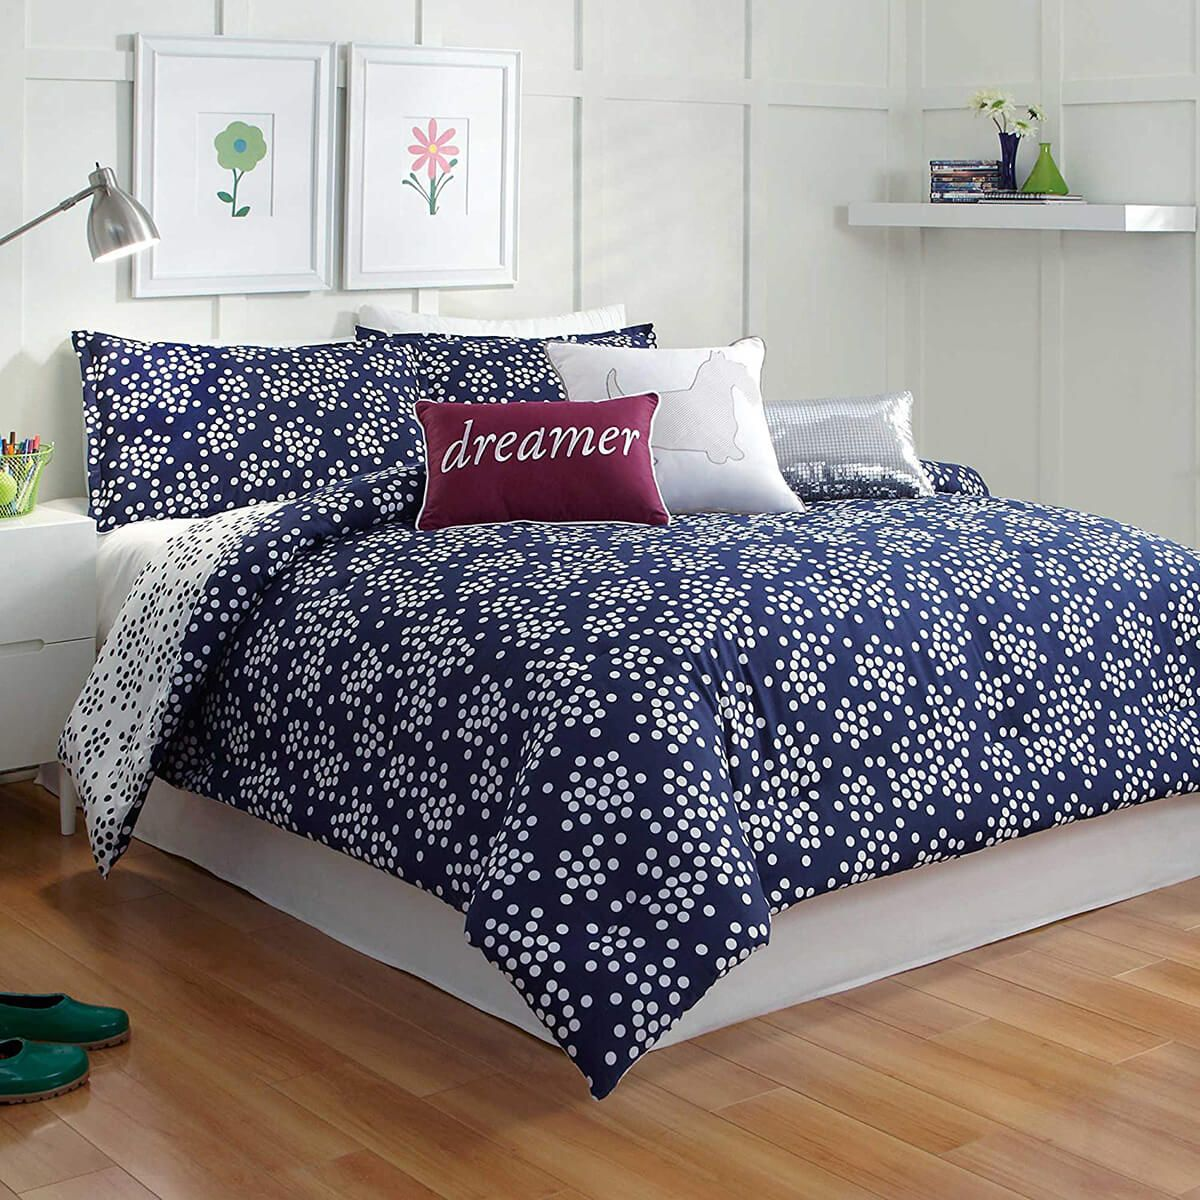 16 Navy Blue Bedroom Design And Decor Ideas For A Timeless Makeover In 2020 Blue Bedroom Design Dorm Bedding Sets Twin Xl Bedding Sets